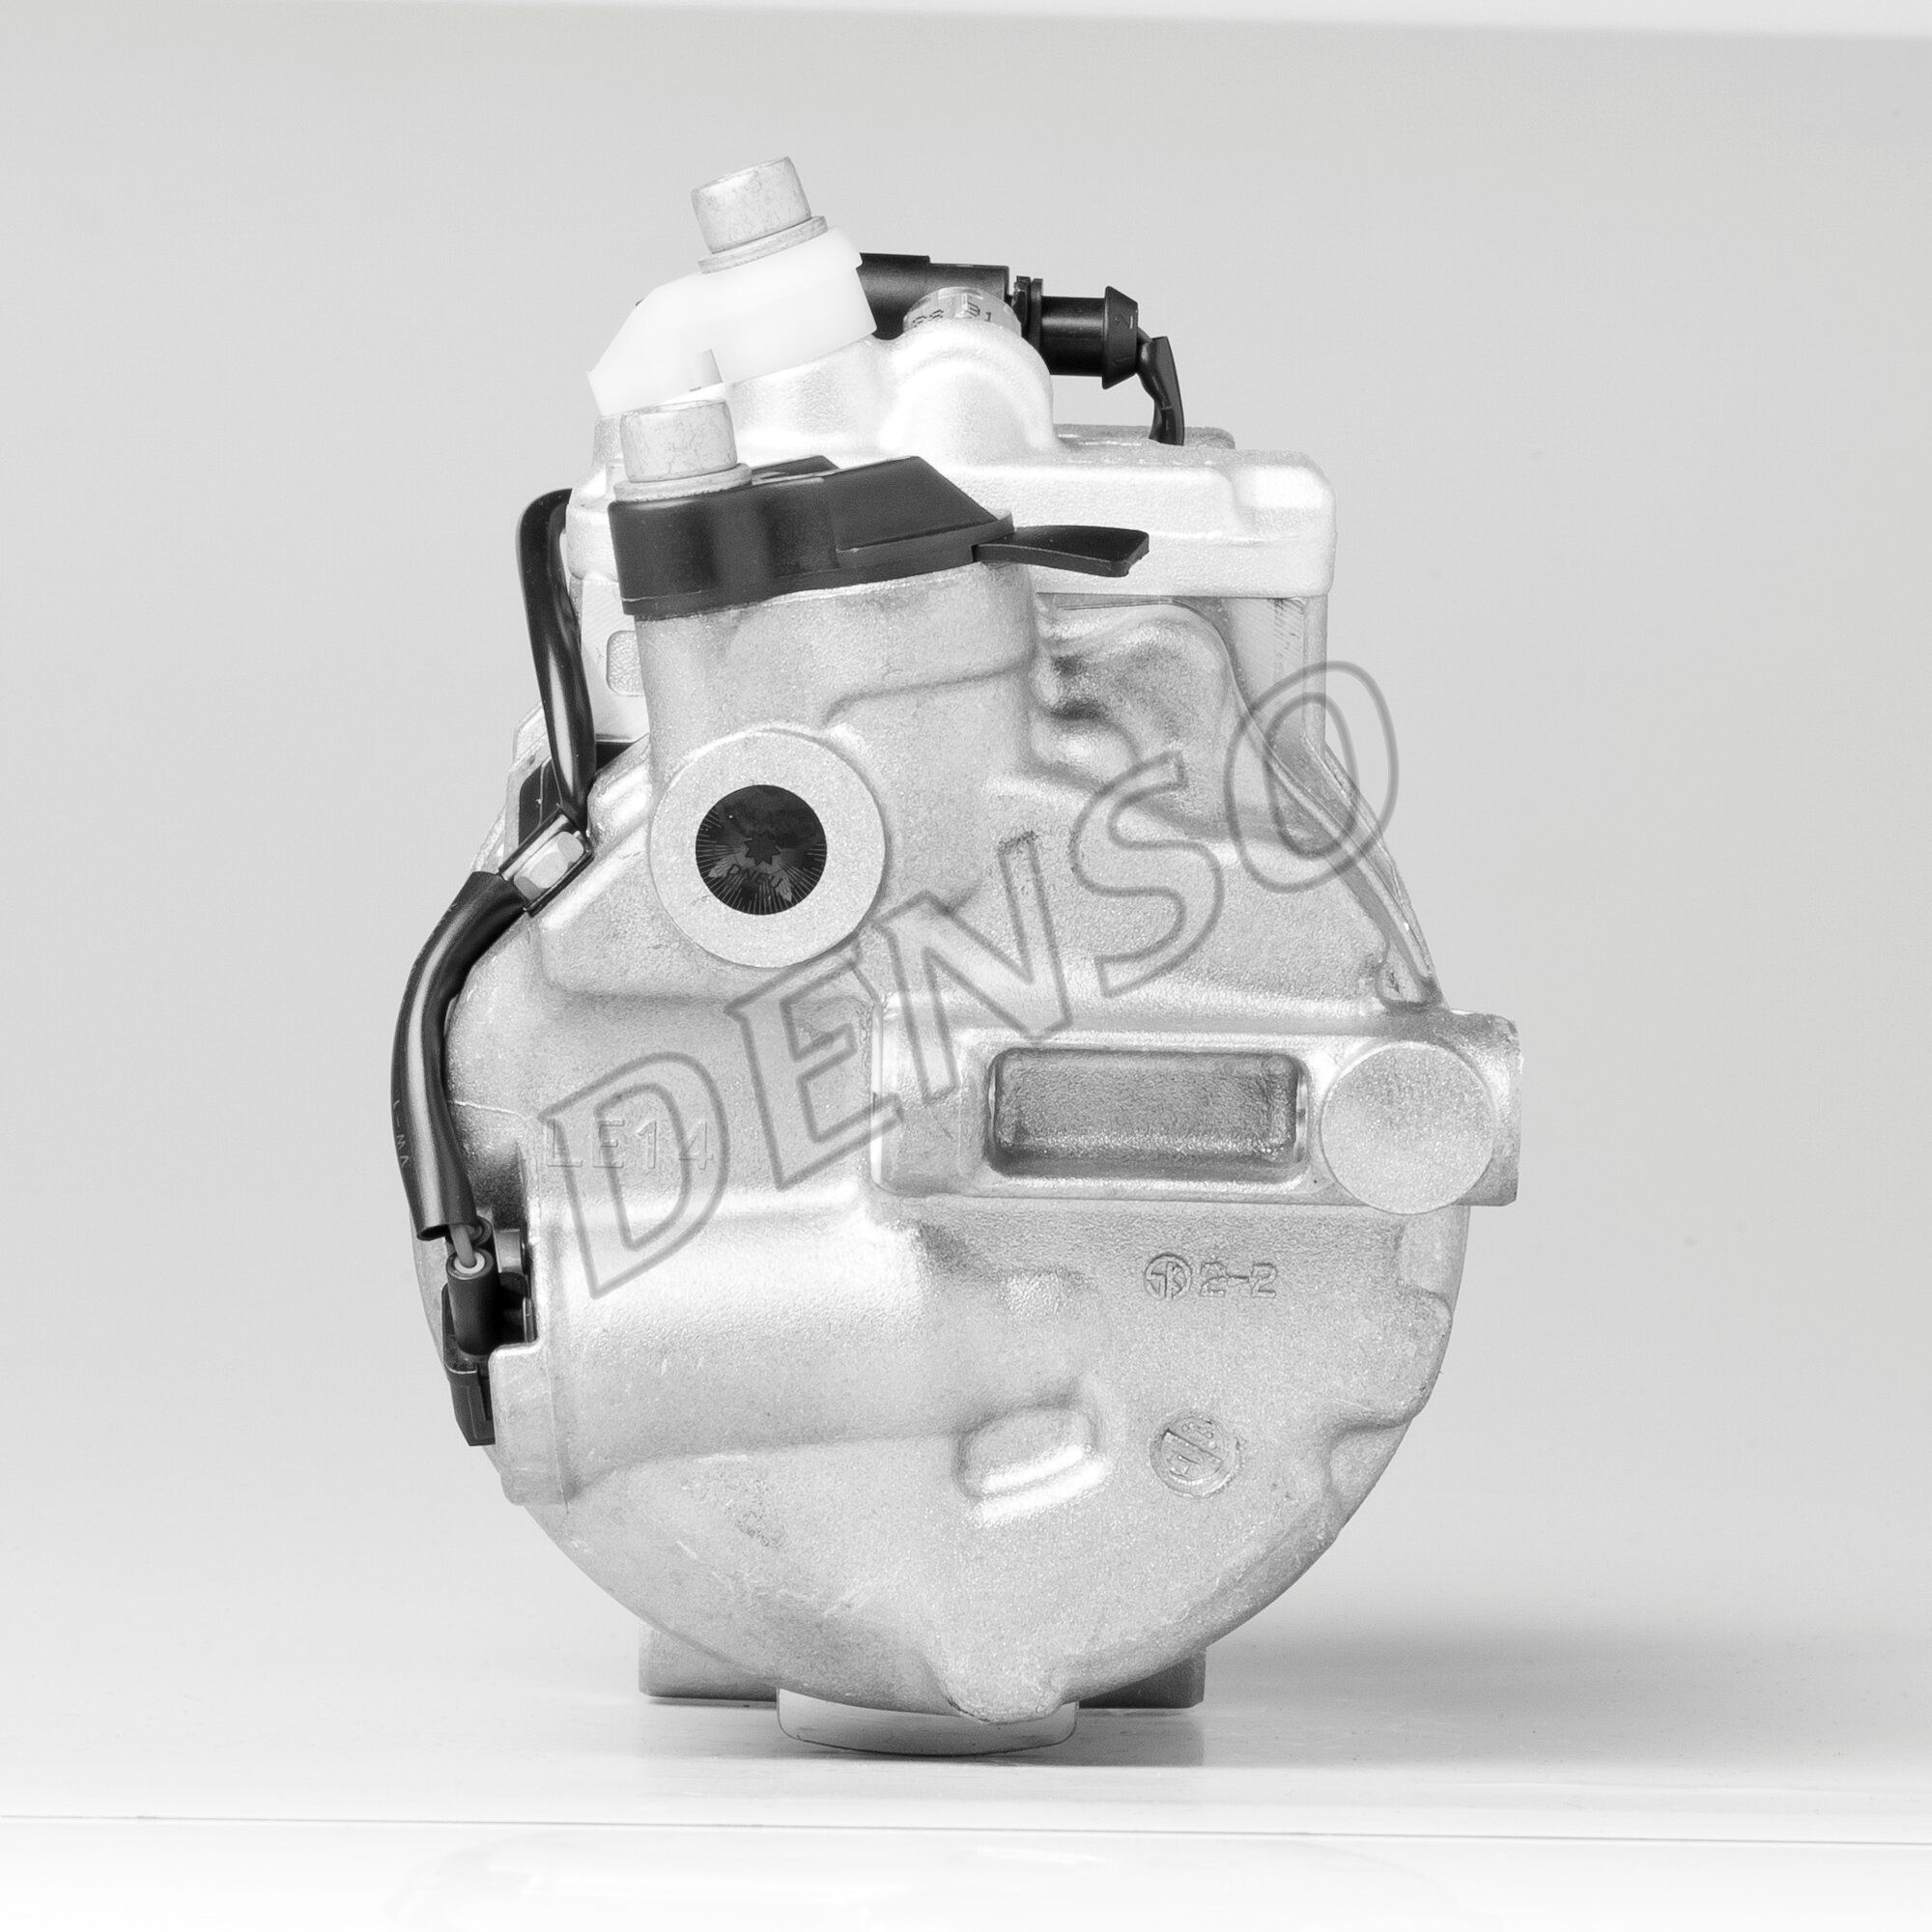 Original PORSCHE Kompressor Klimaanlage DCP32052